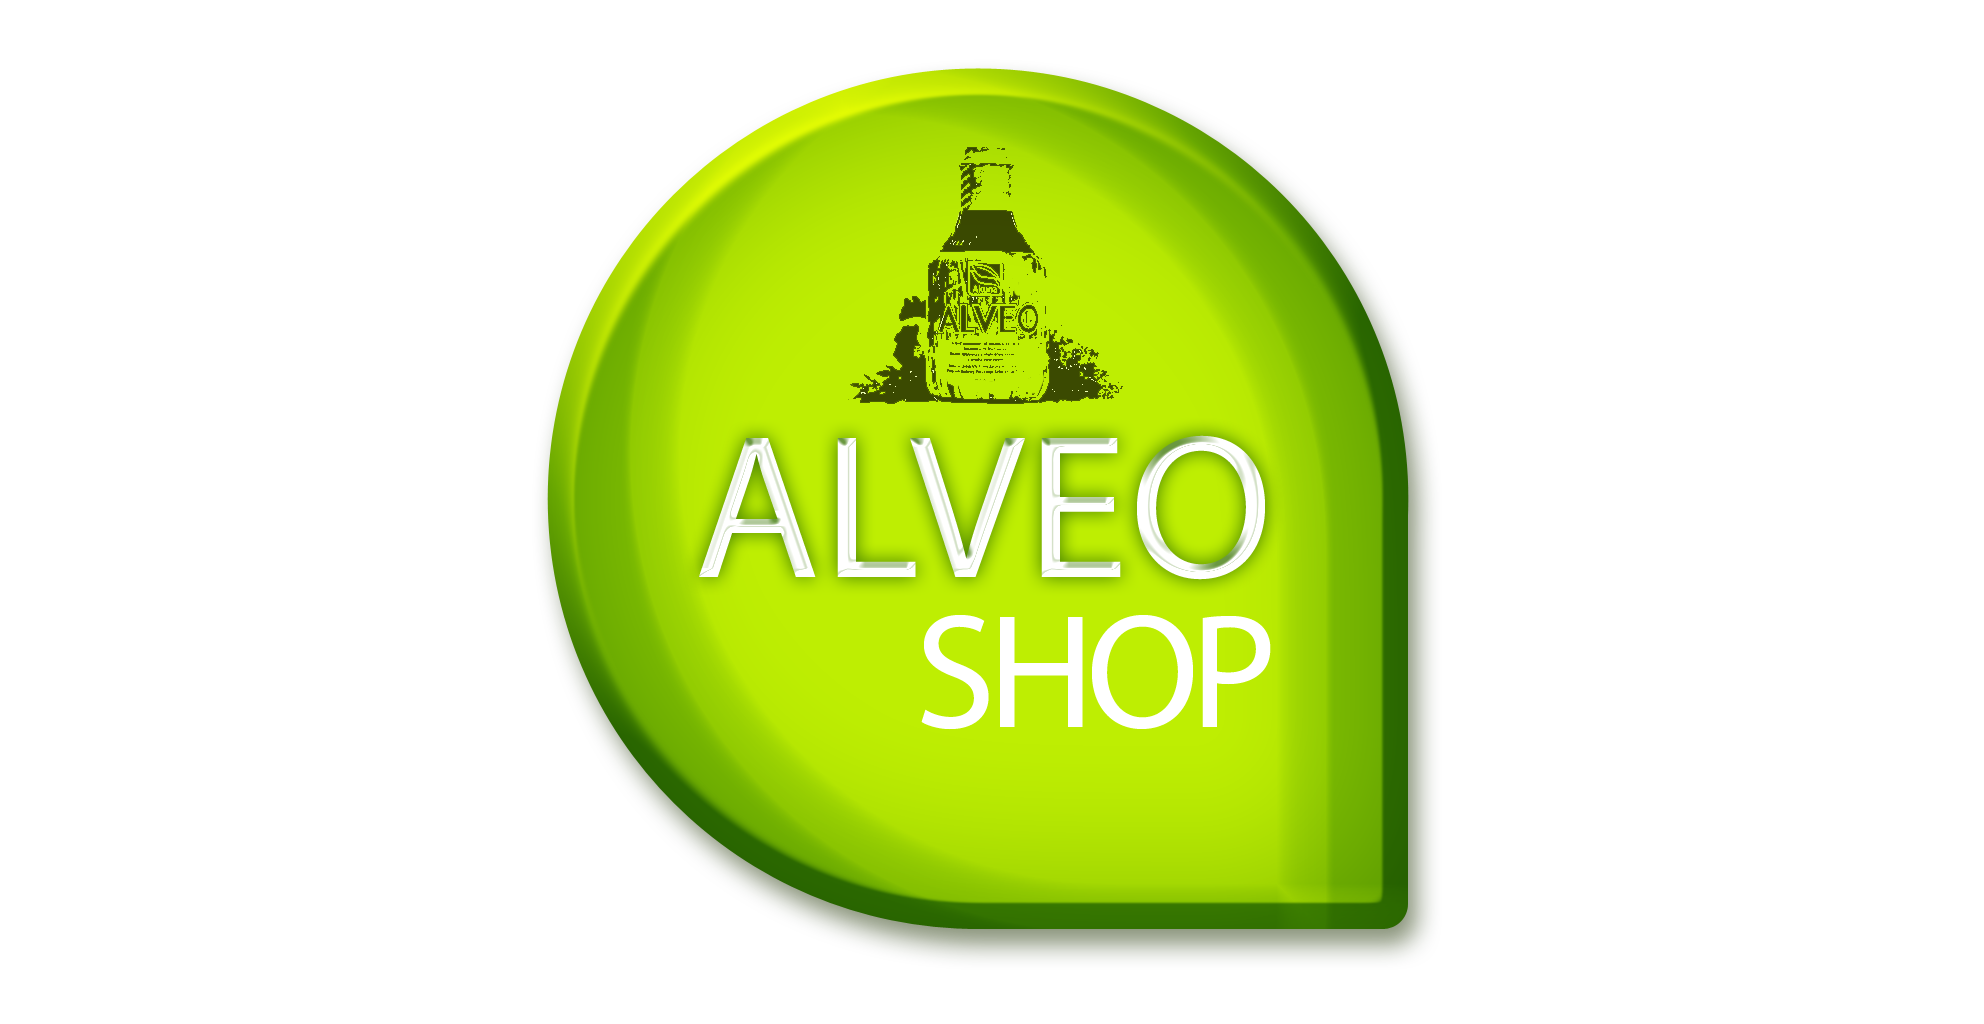 Alveoshop logo